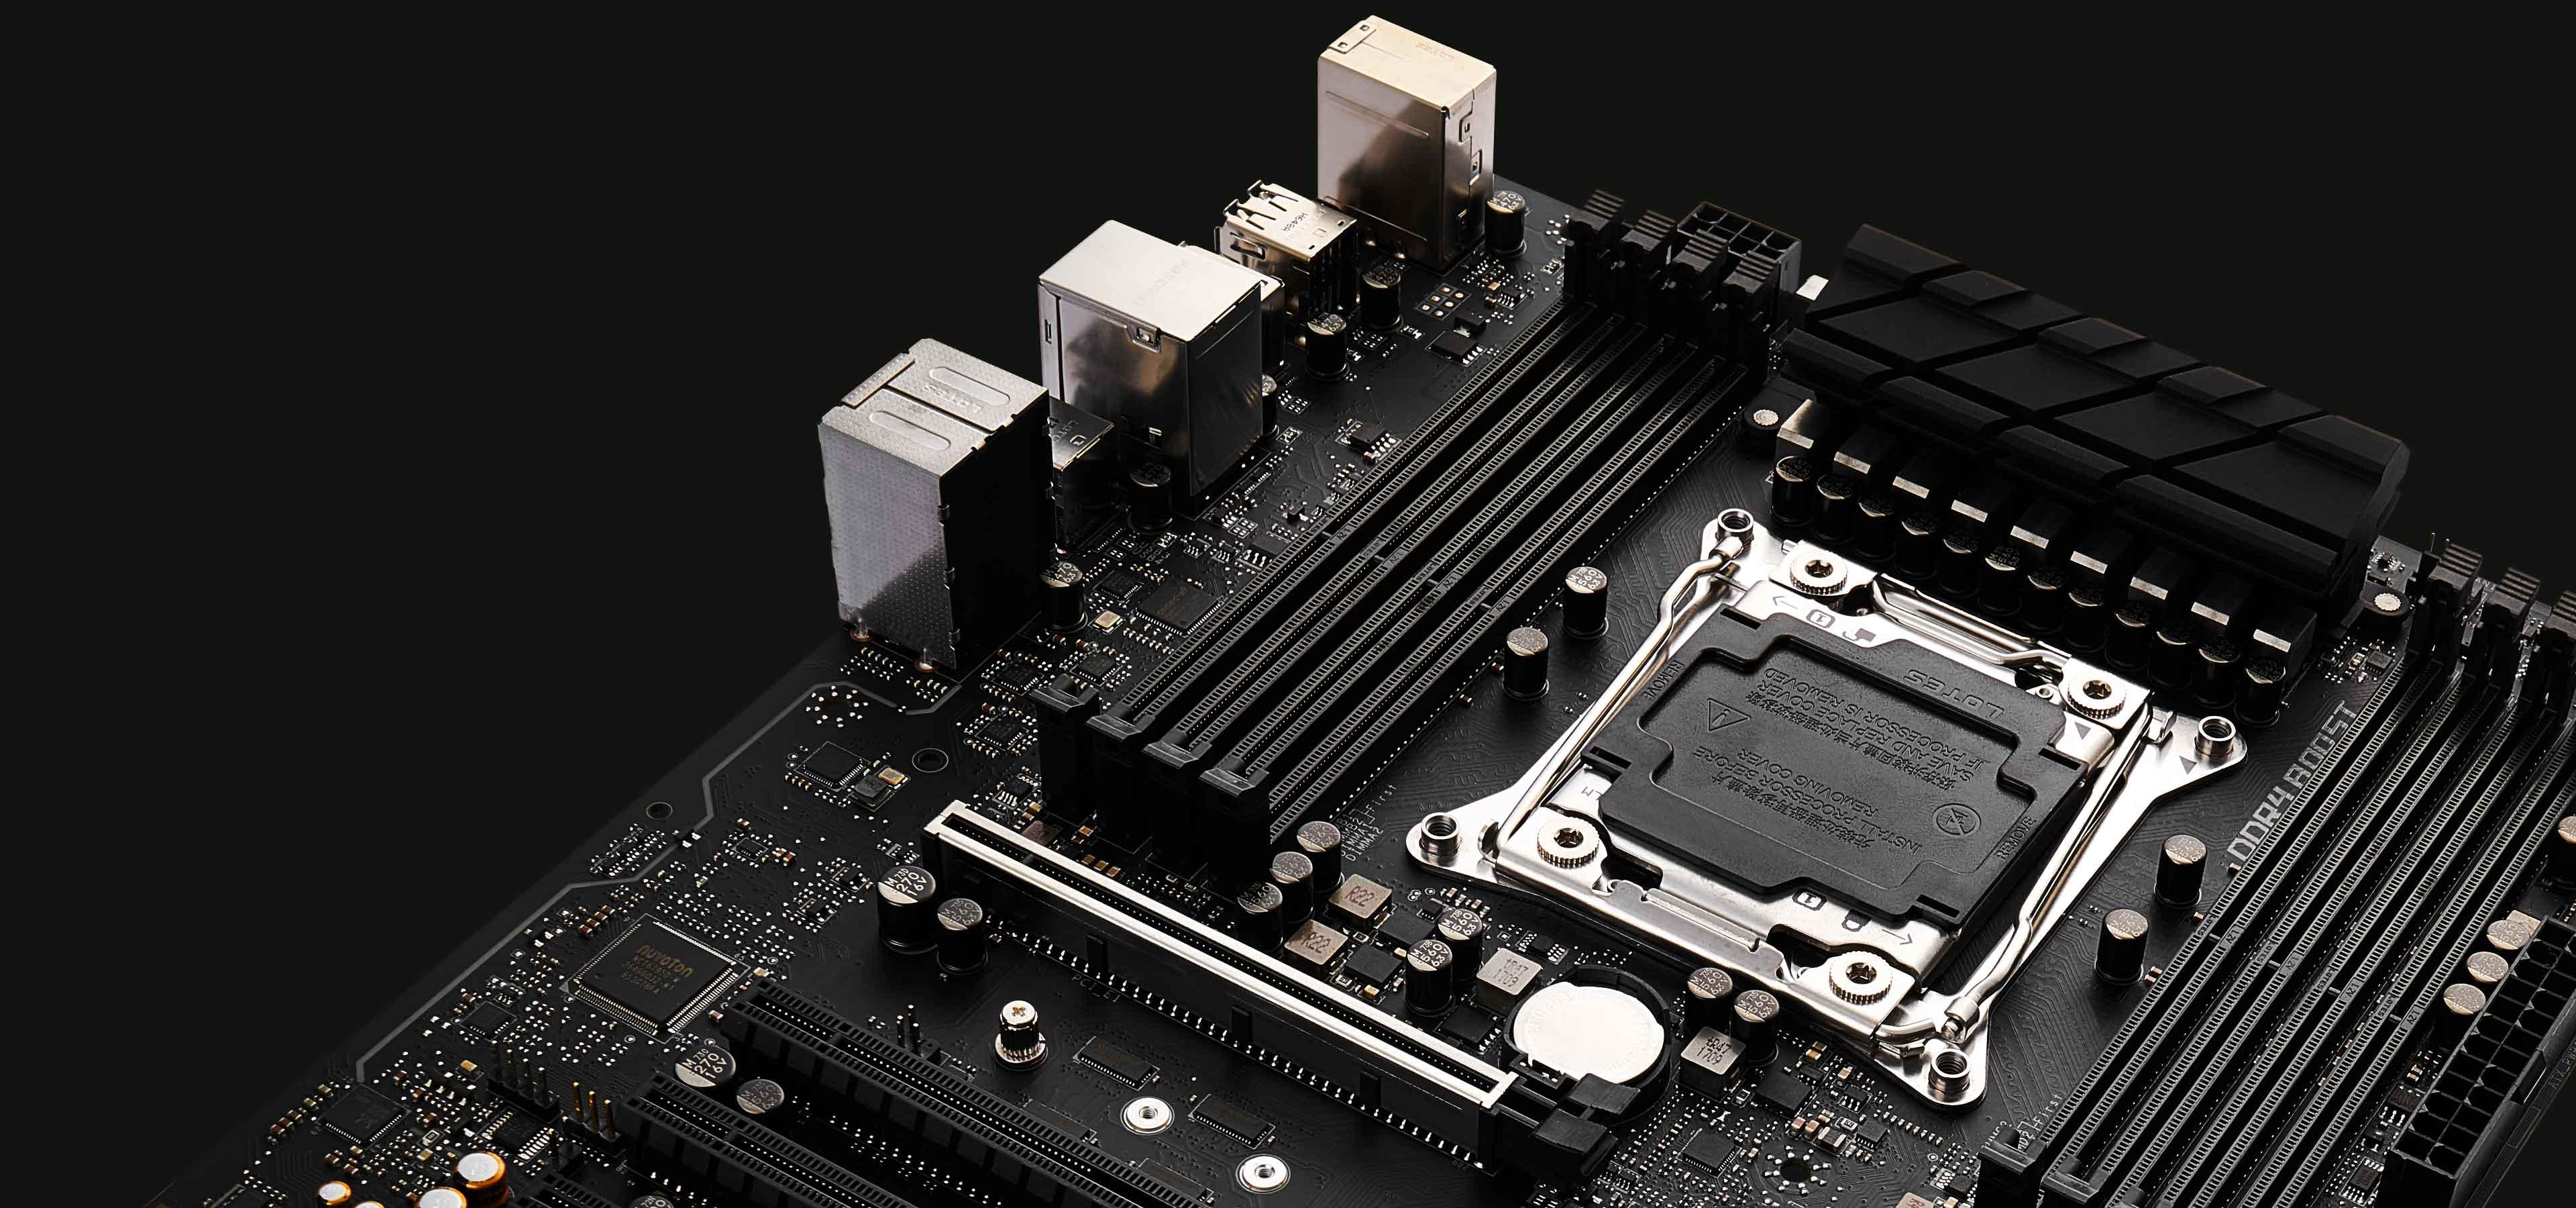 For Neat HighEnd PC Build MSI X299 RAIDER Motherboard MSI Global